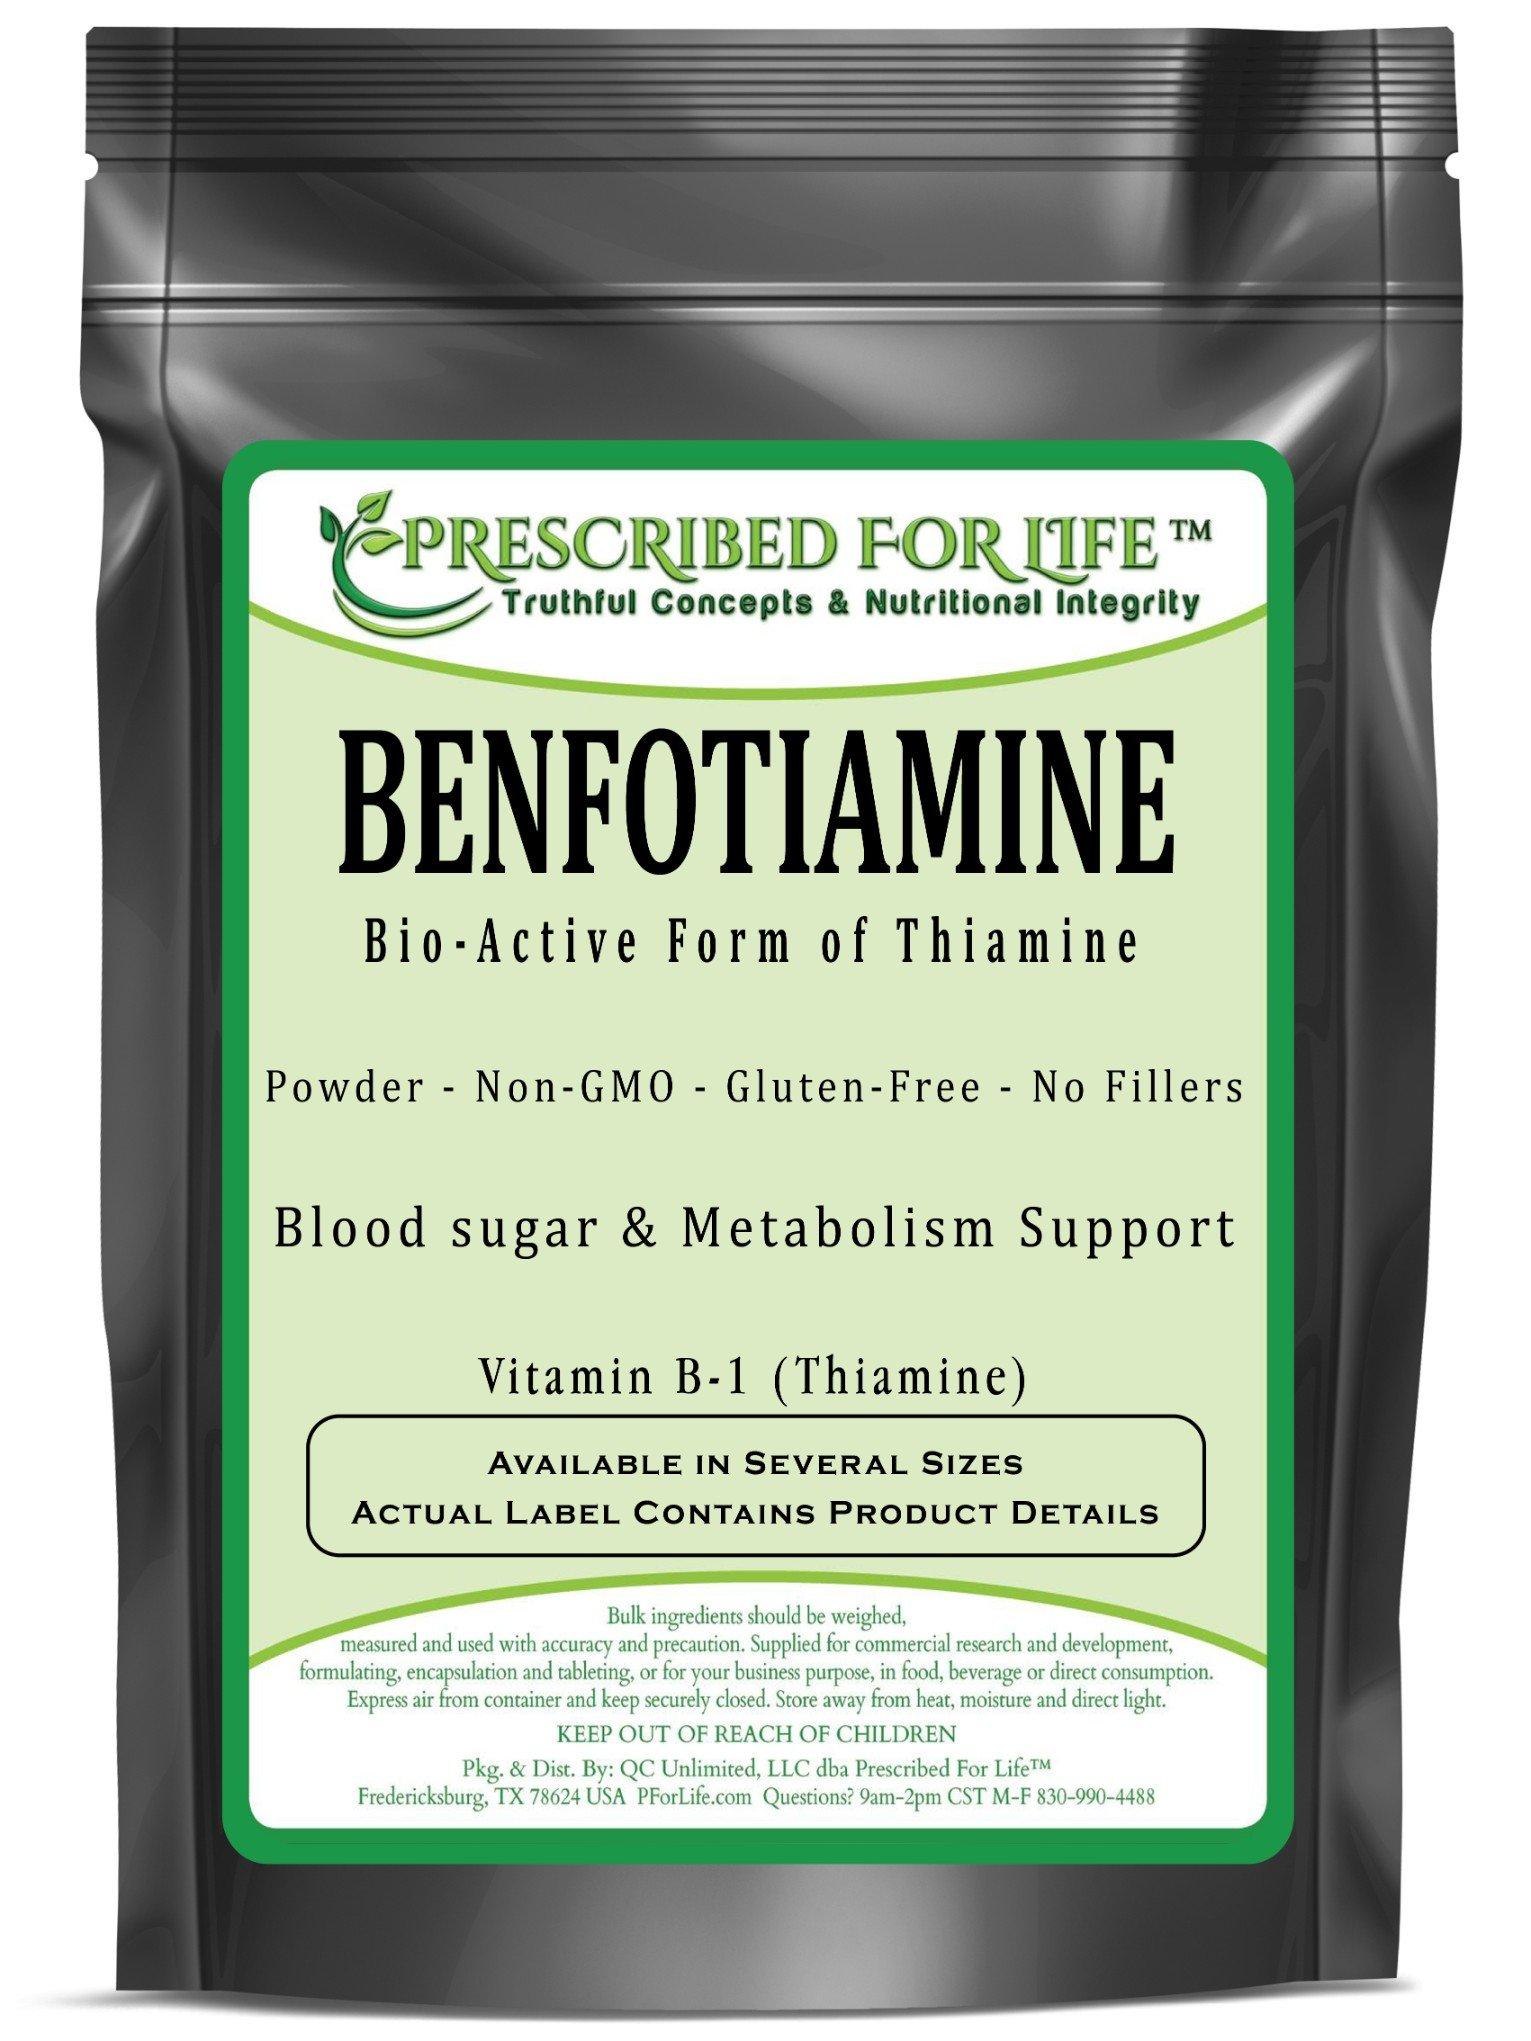 Benfotiamine - BioActive Form of Thiamine - Vitamin B-1 Powder, 2 oz